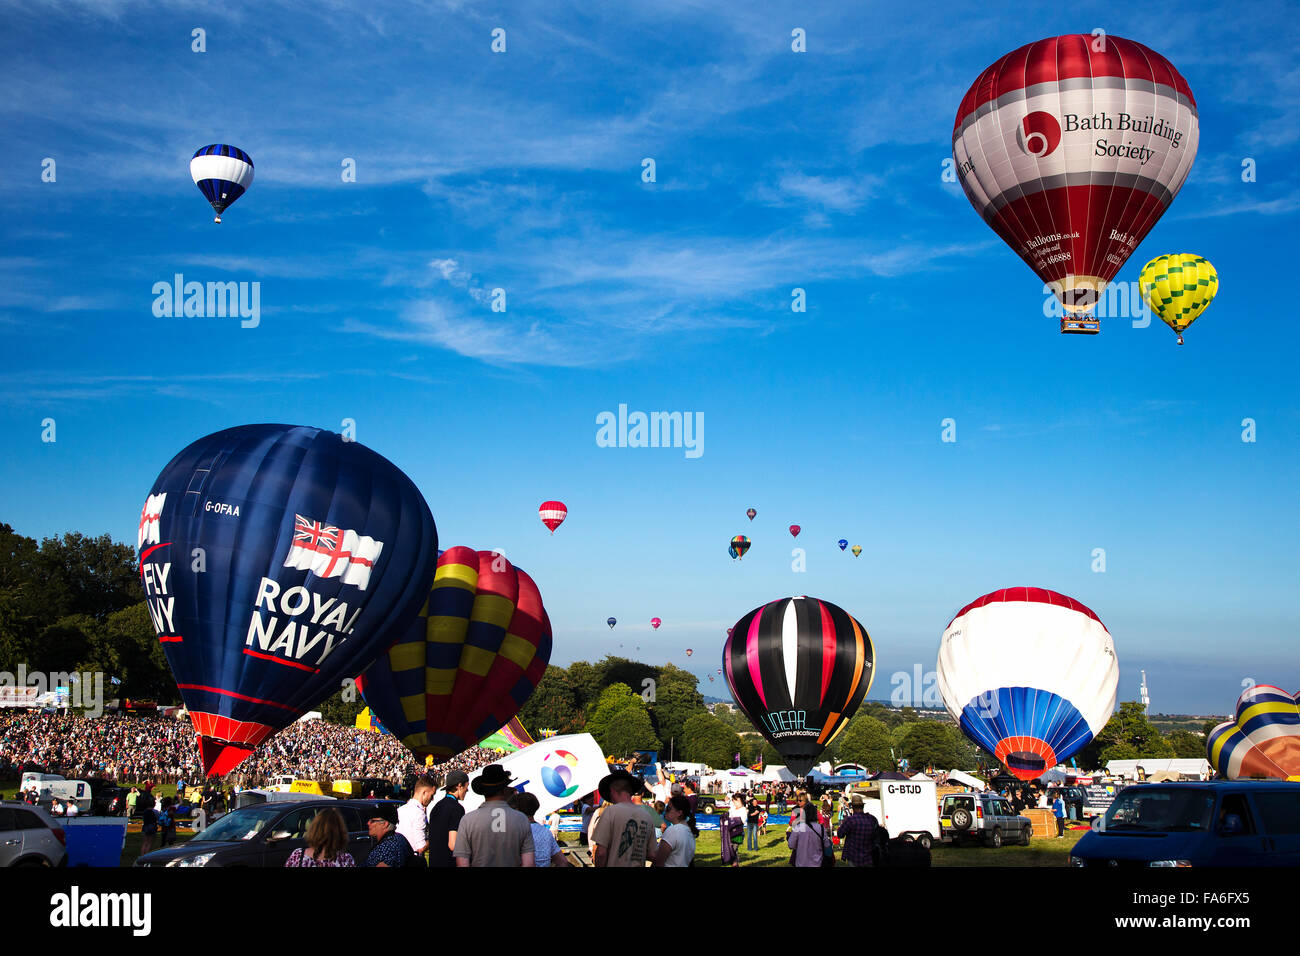 Bristol International Hot Air Balloon Fiesta 2015 Stock Photo